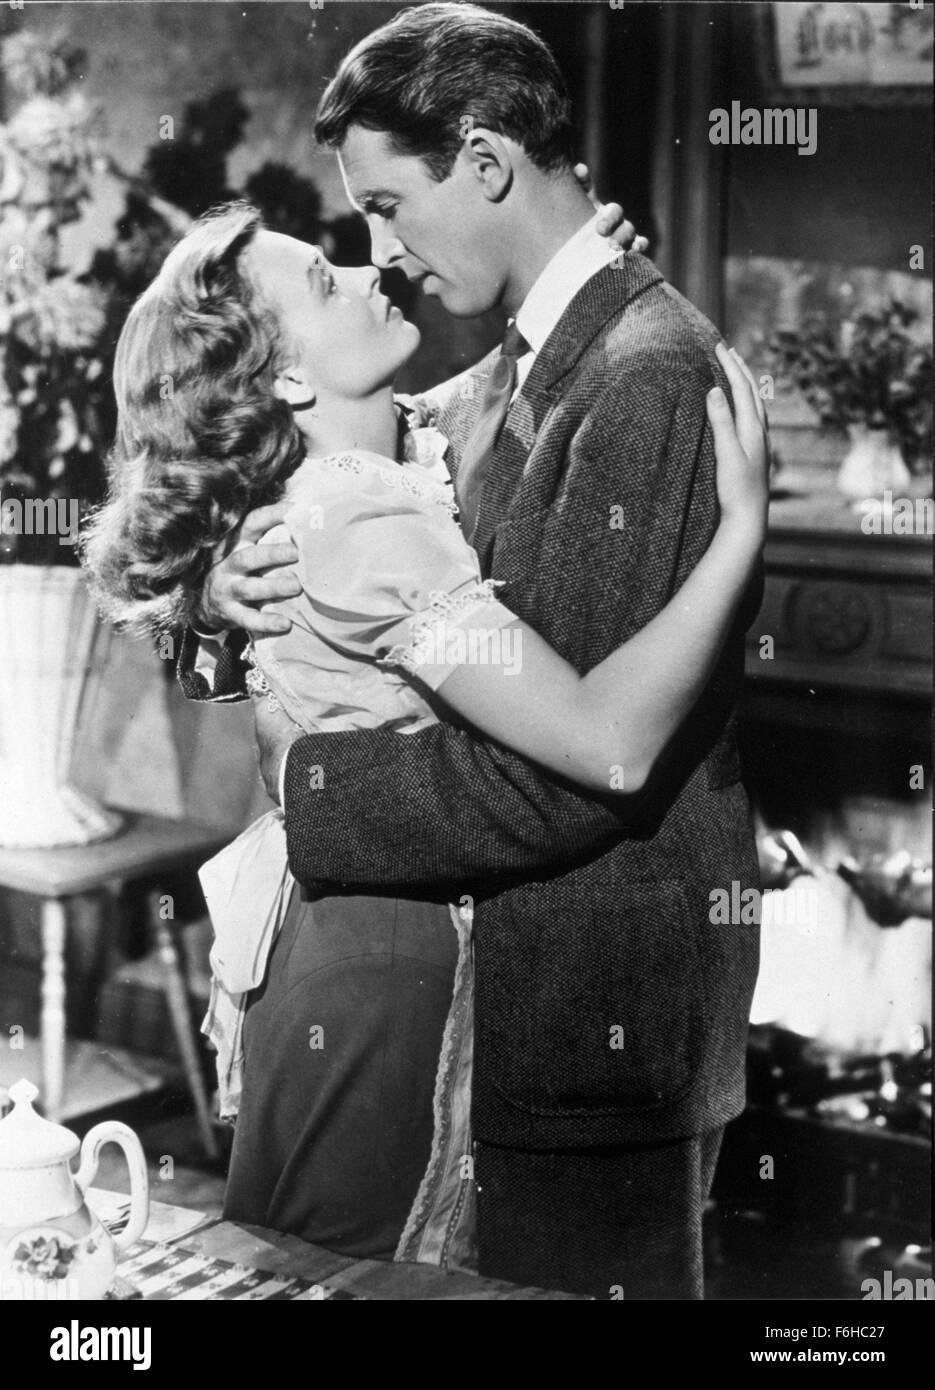 1946 Film Title It 39 S A Wonderful Life Director Frank Capra Stock Photo Royalty Free Image